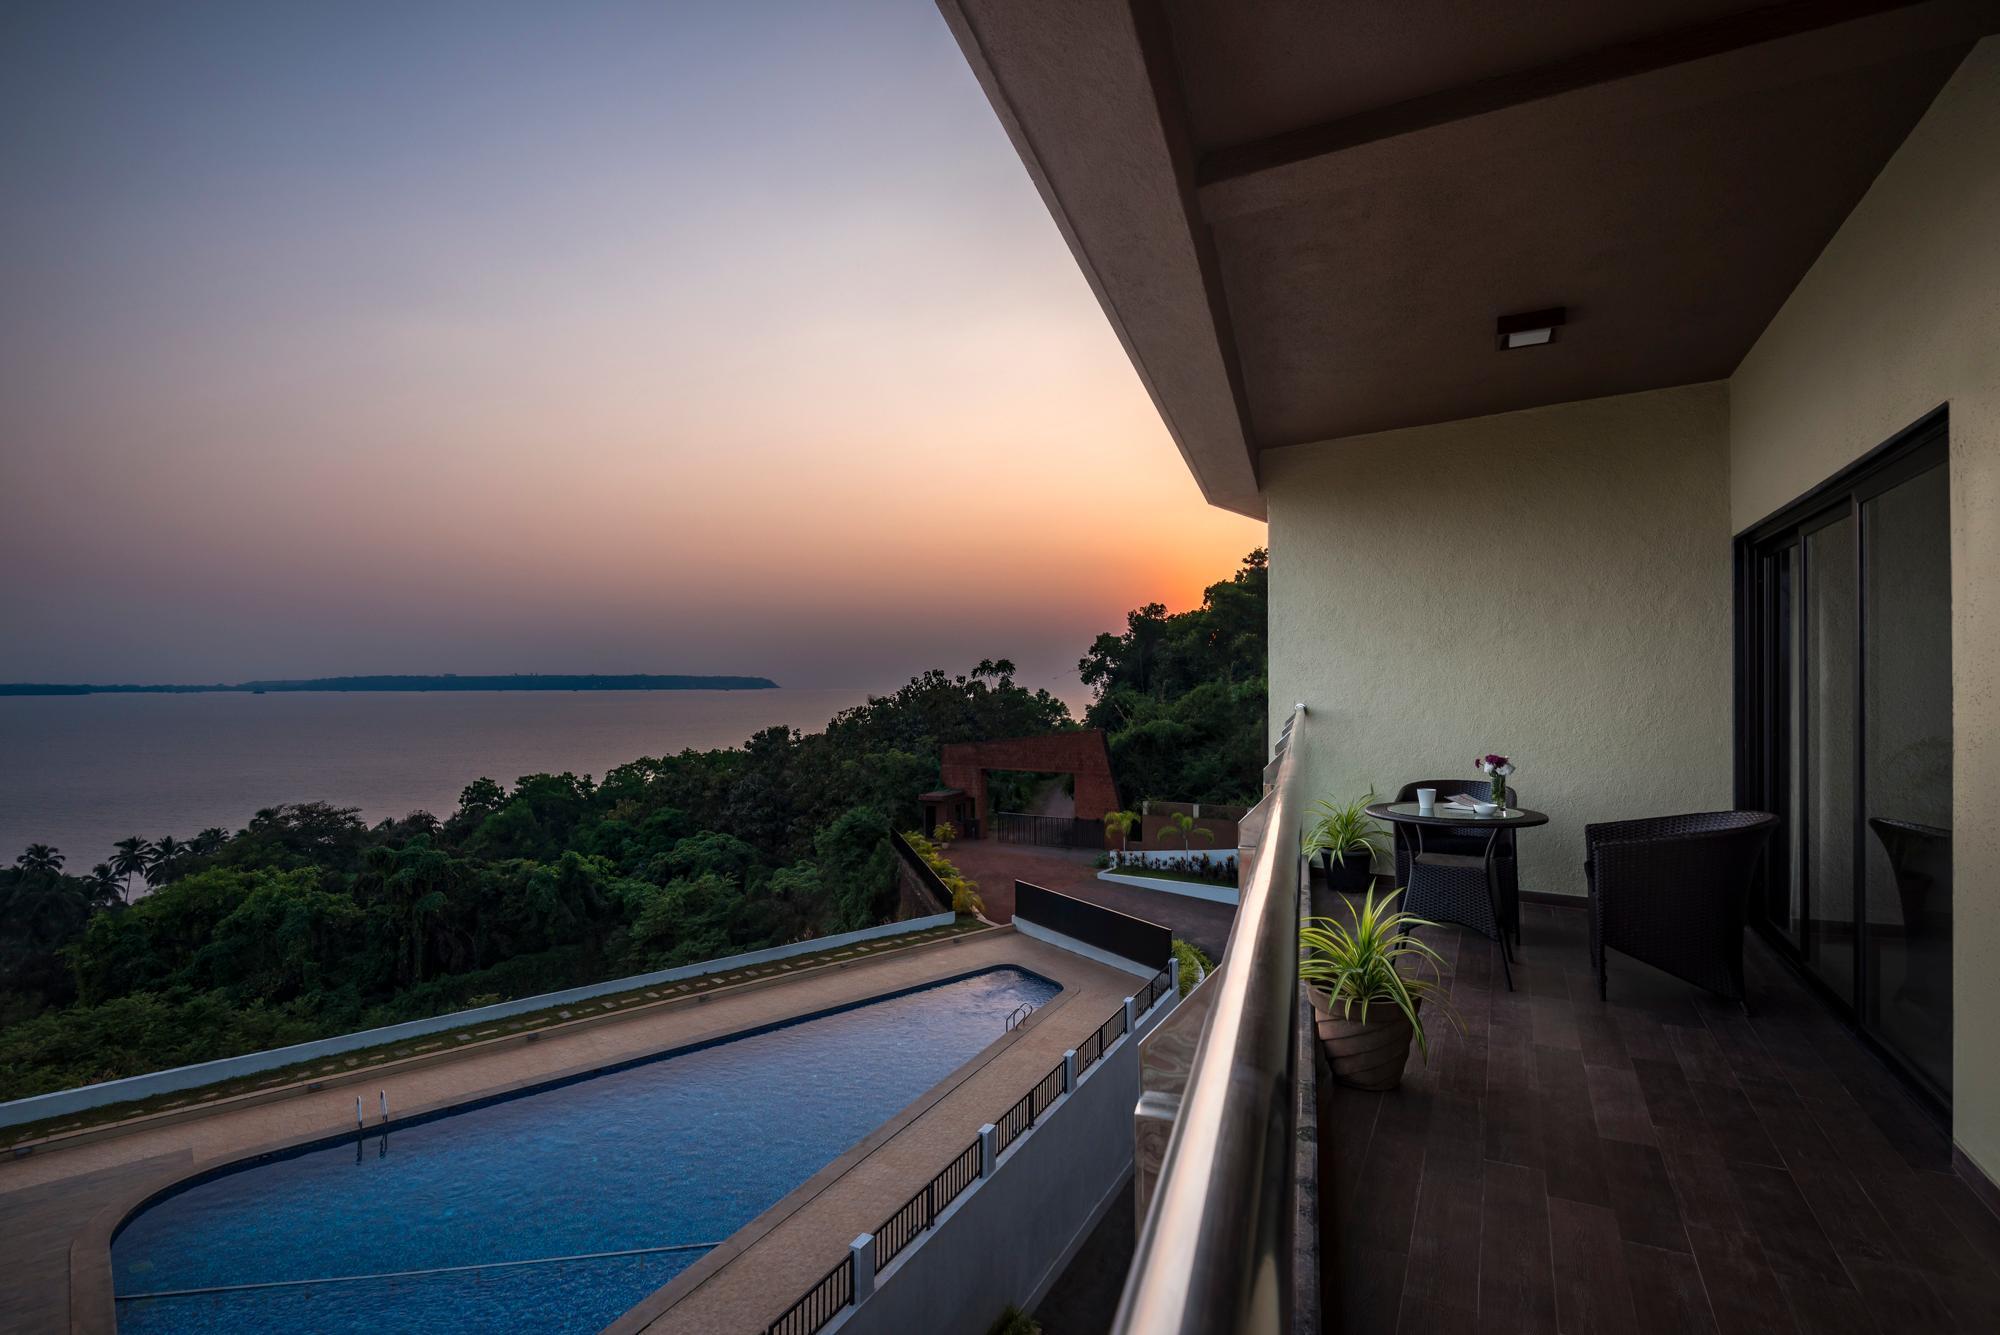 3BHK Luxury Sea View Apartment B2